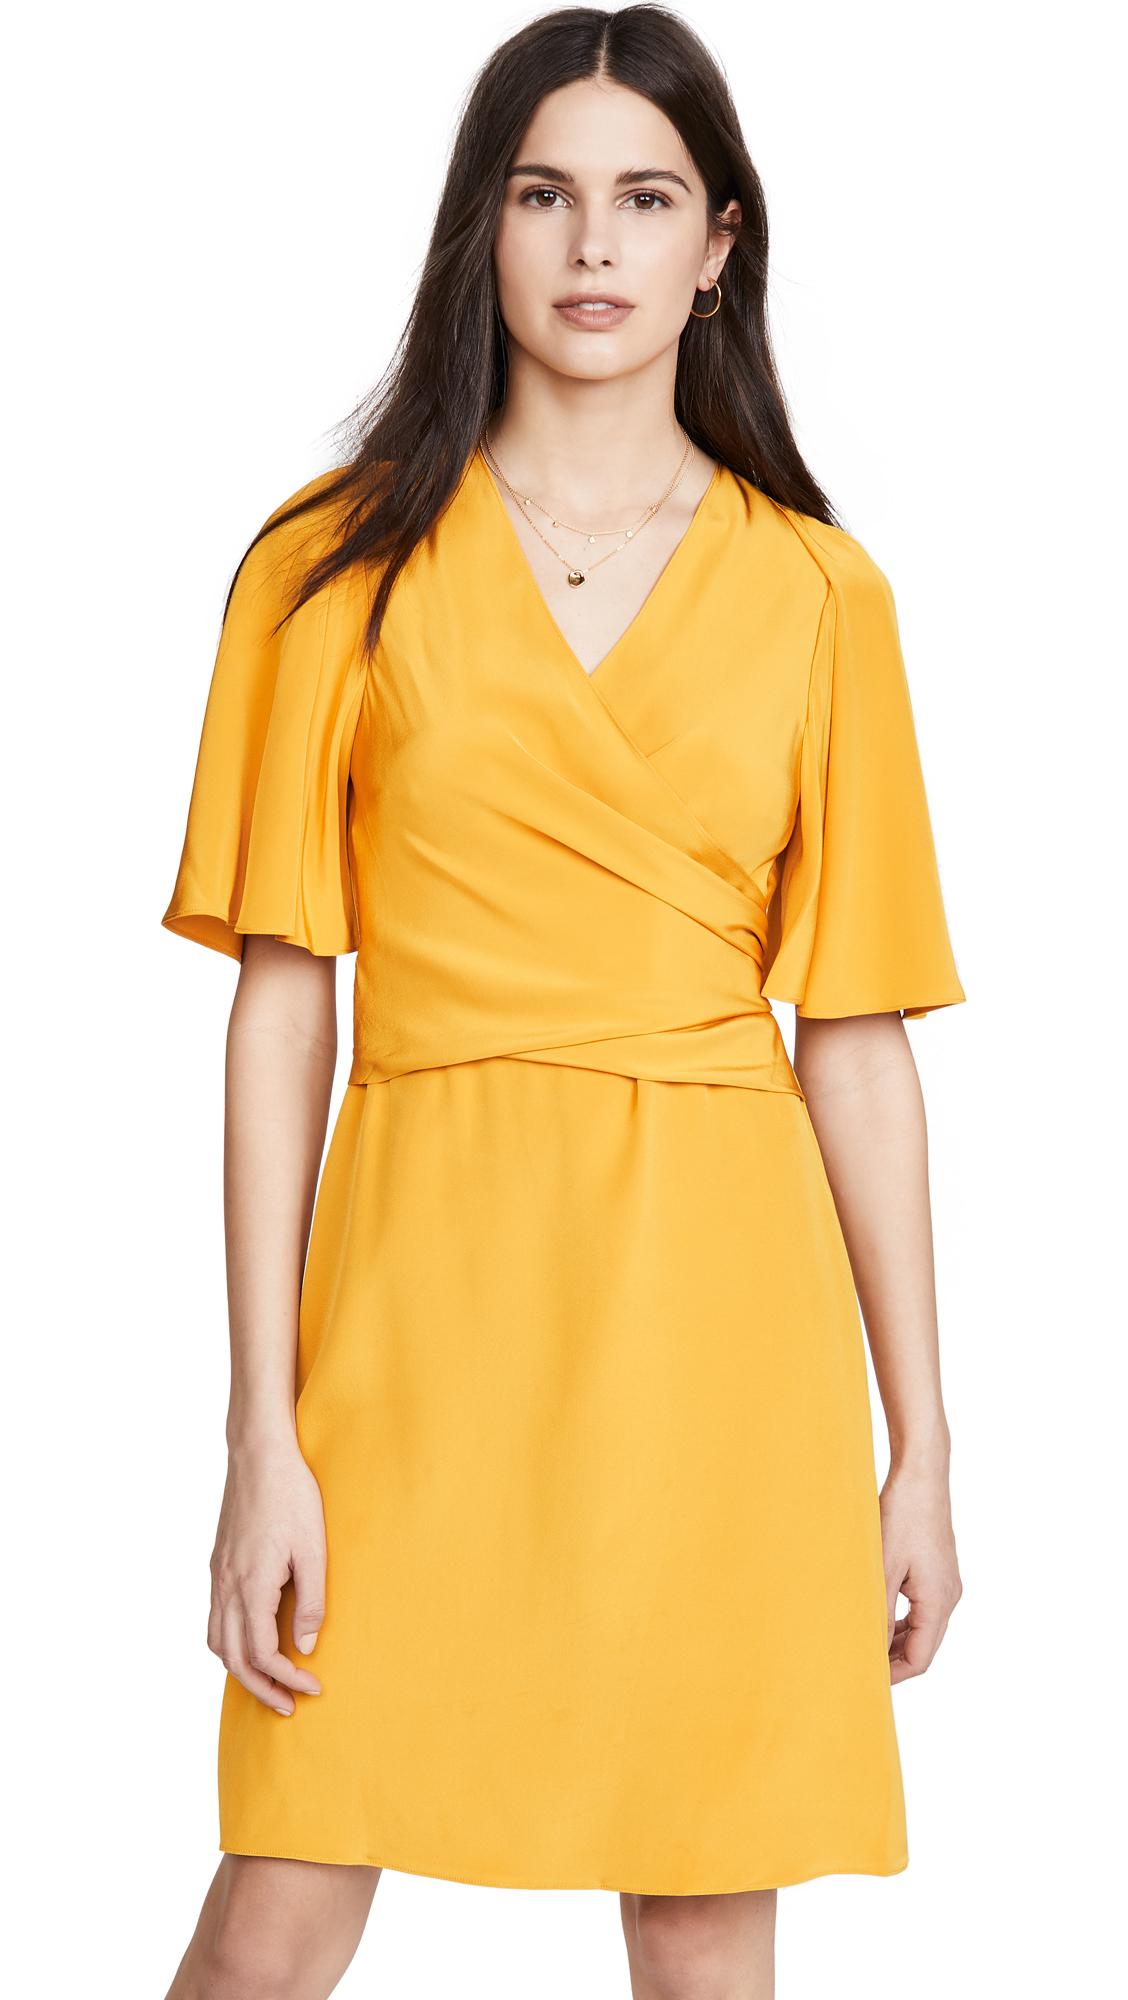 Kobi Halperin Maggie Dress - 50% Off Sale